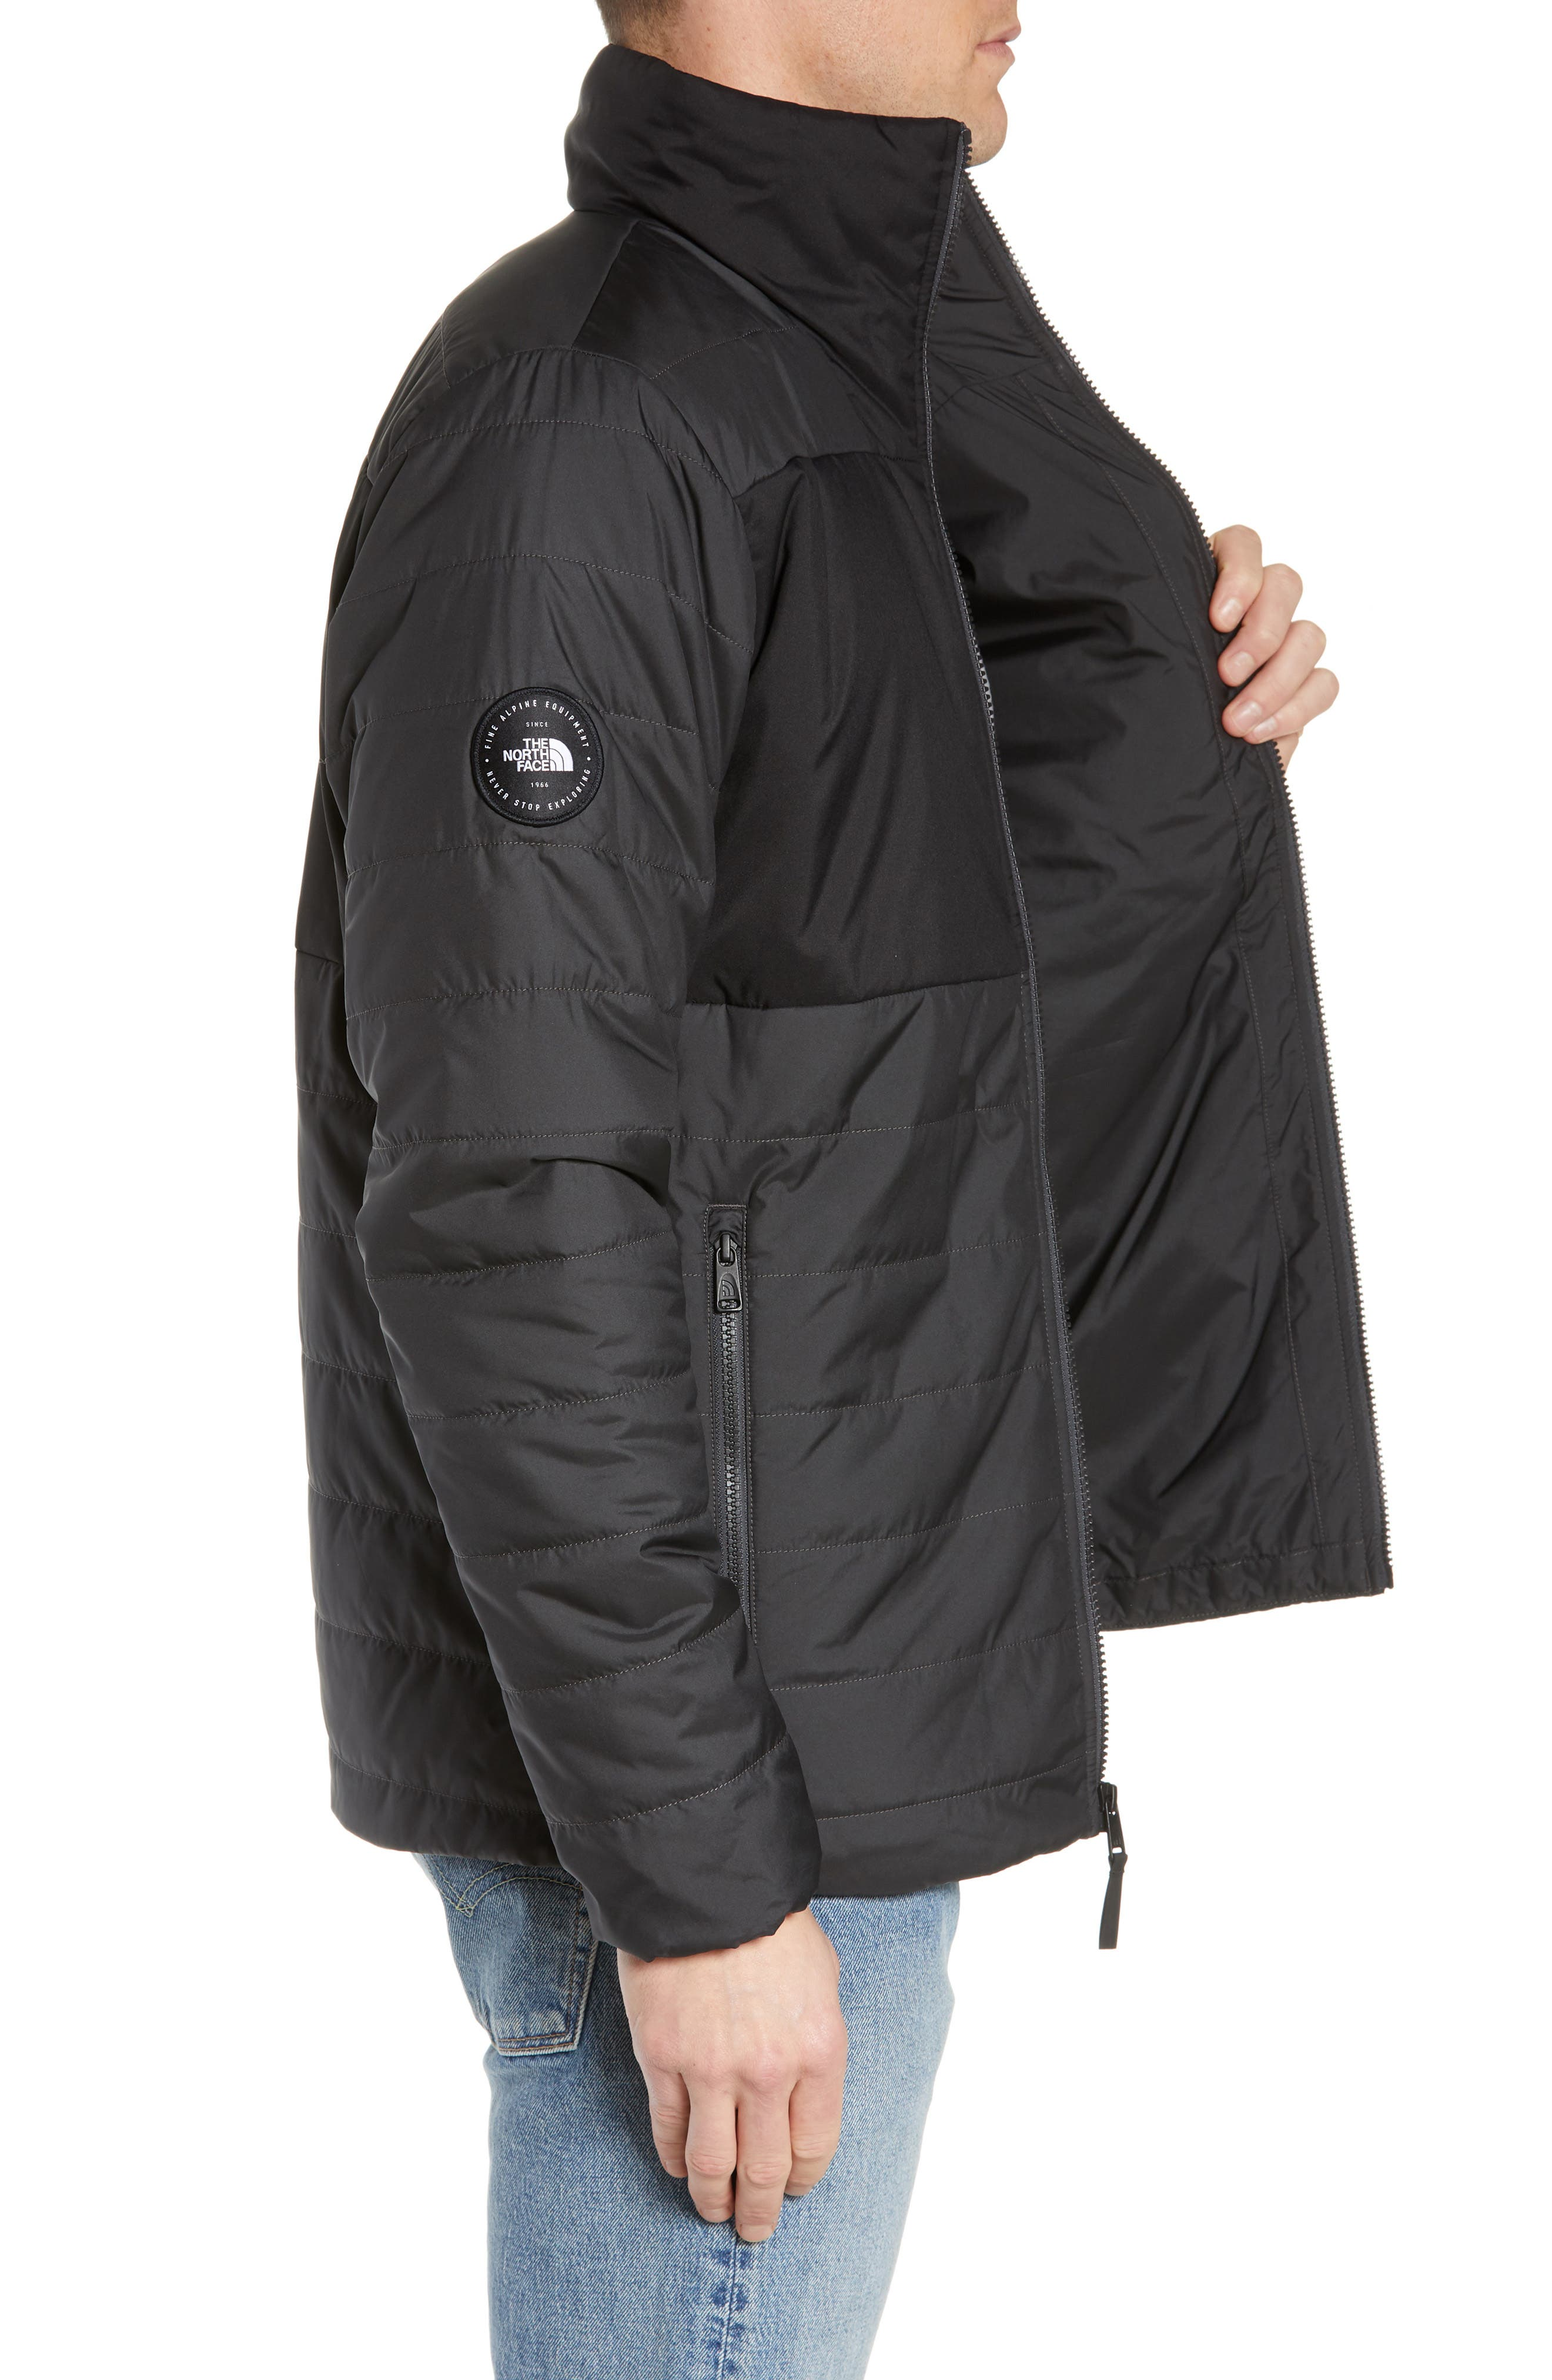 THE NORTH FACE, Insulated Jacket, Alternate thumbnail 4, color, TNF BLACK/ ASPHALT GREY